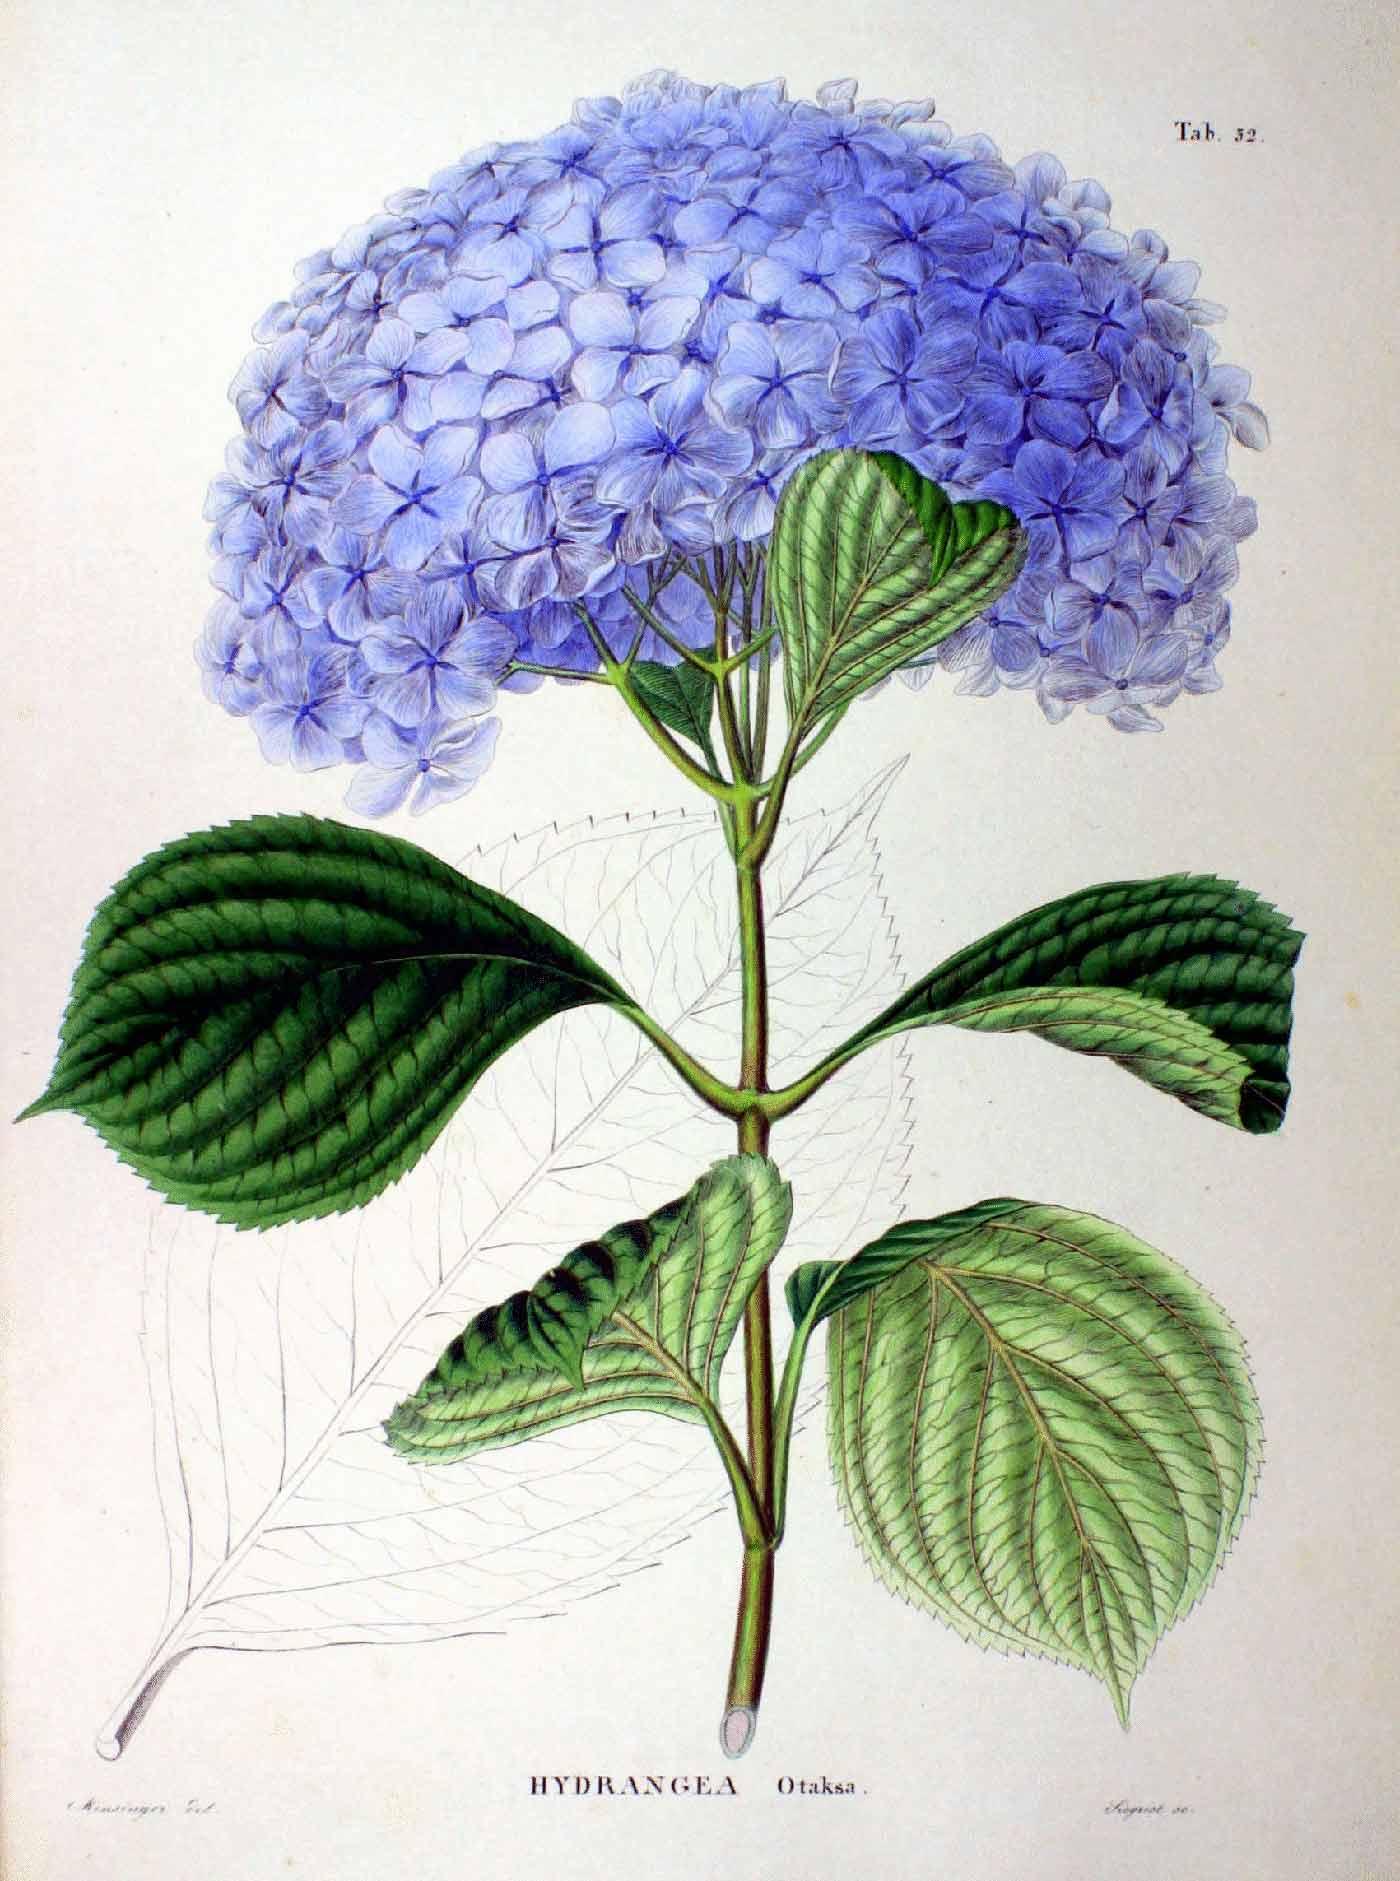 Raffigurazione di <i>Hydrangea macrophylla</i> dalla <i>Flora</i> di Siebold e Zuccarini.